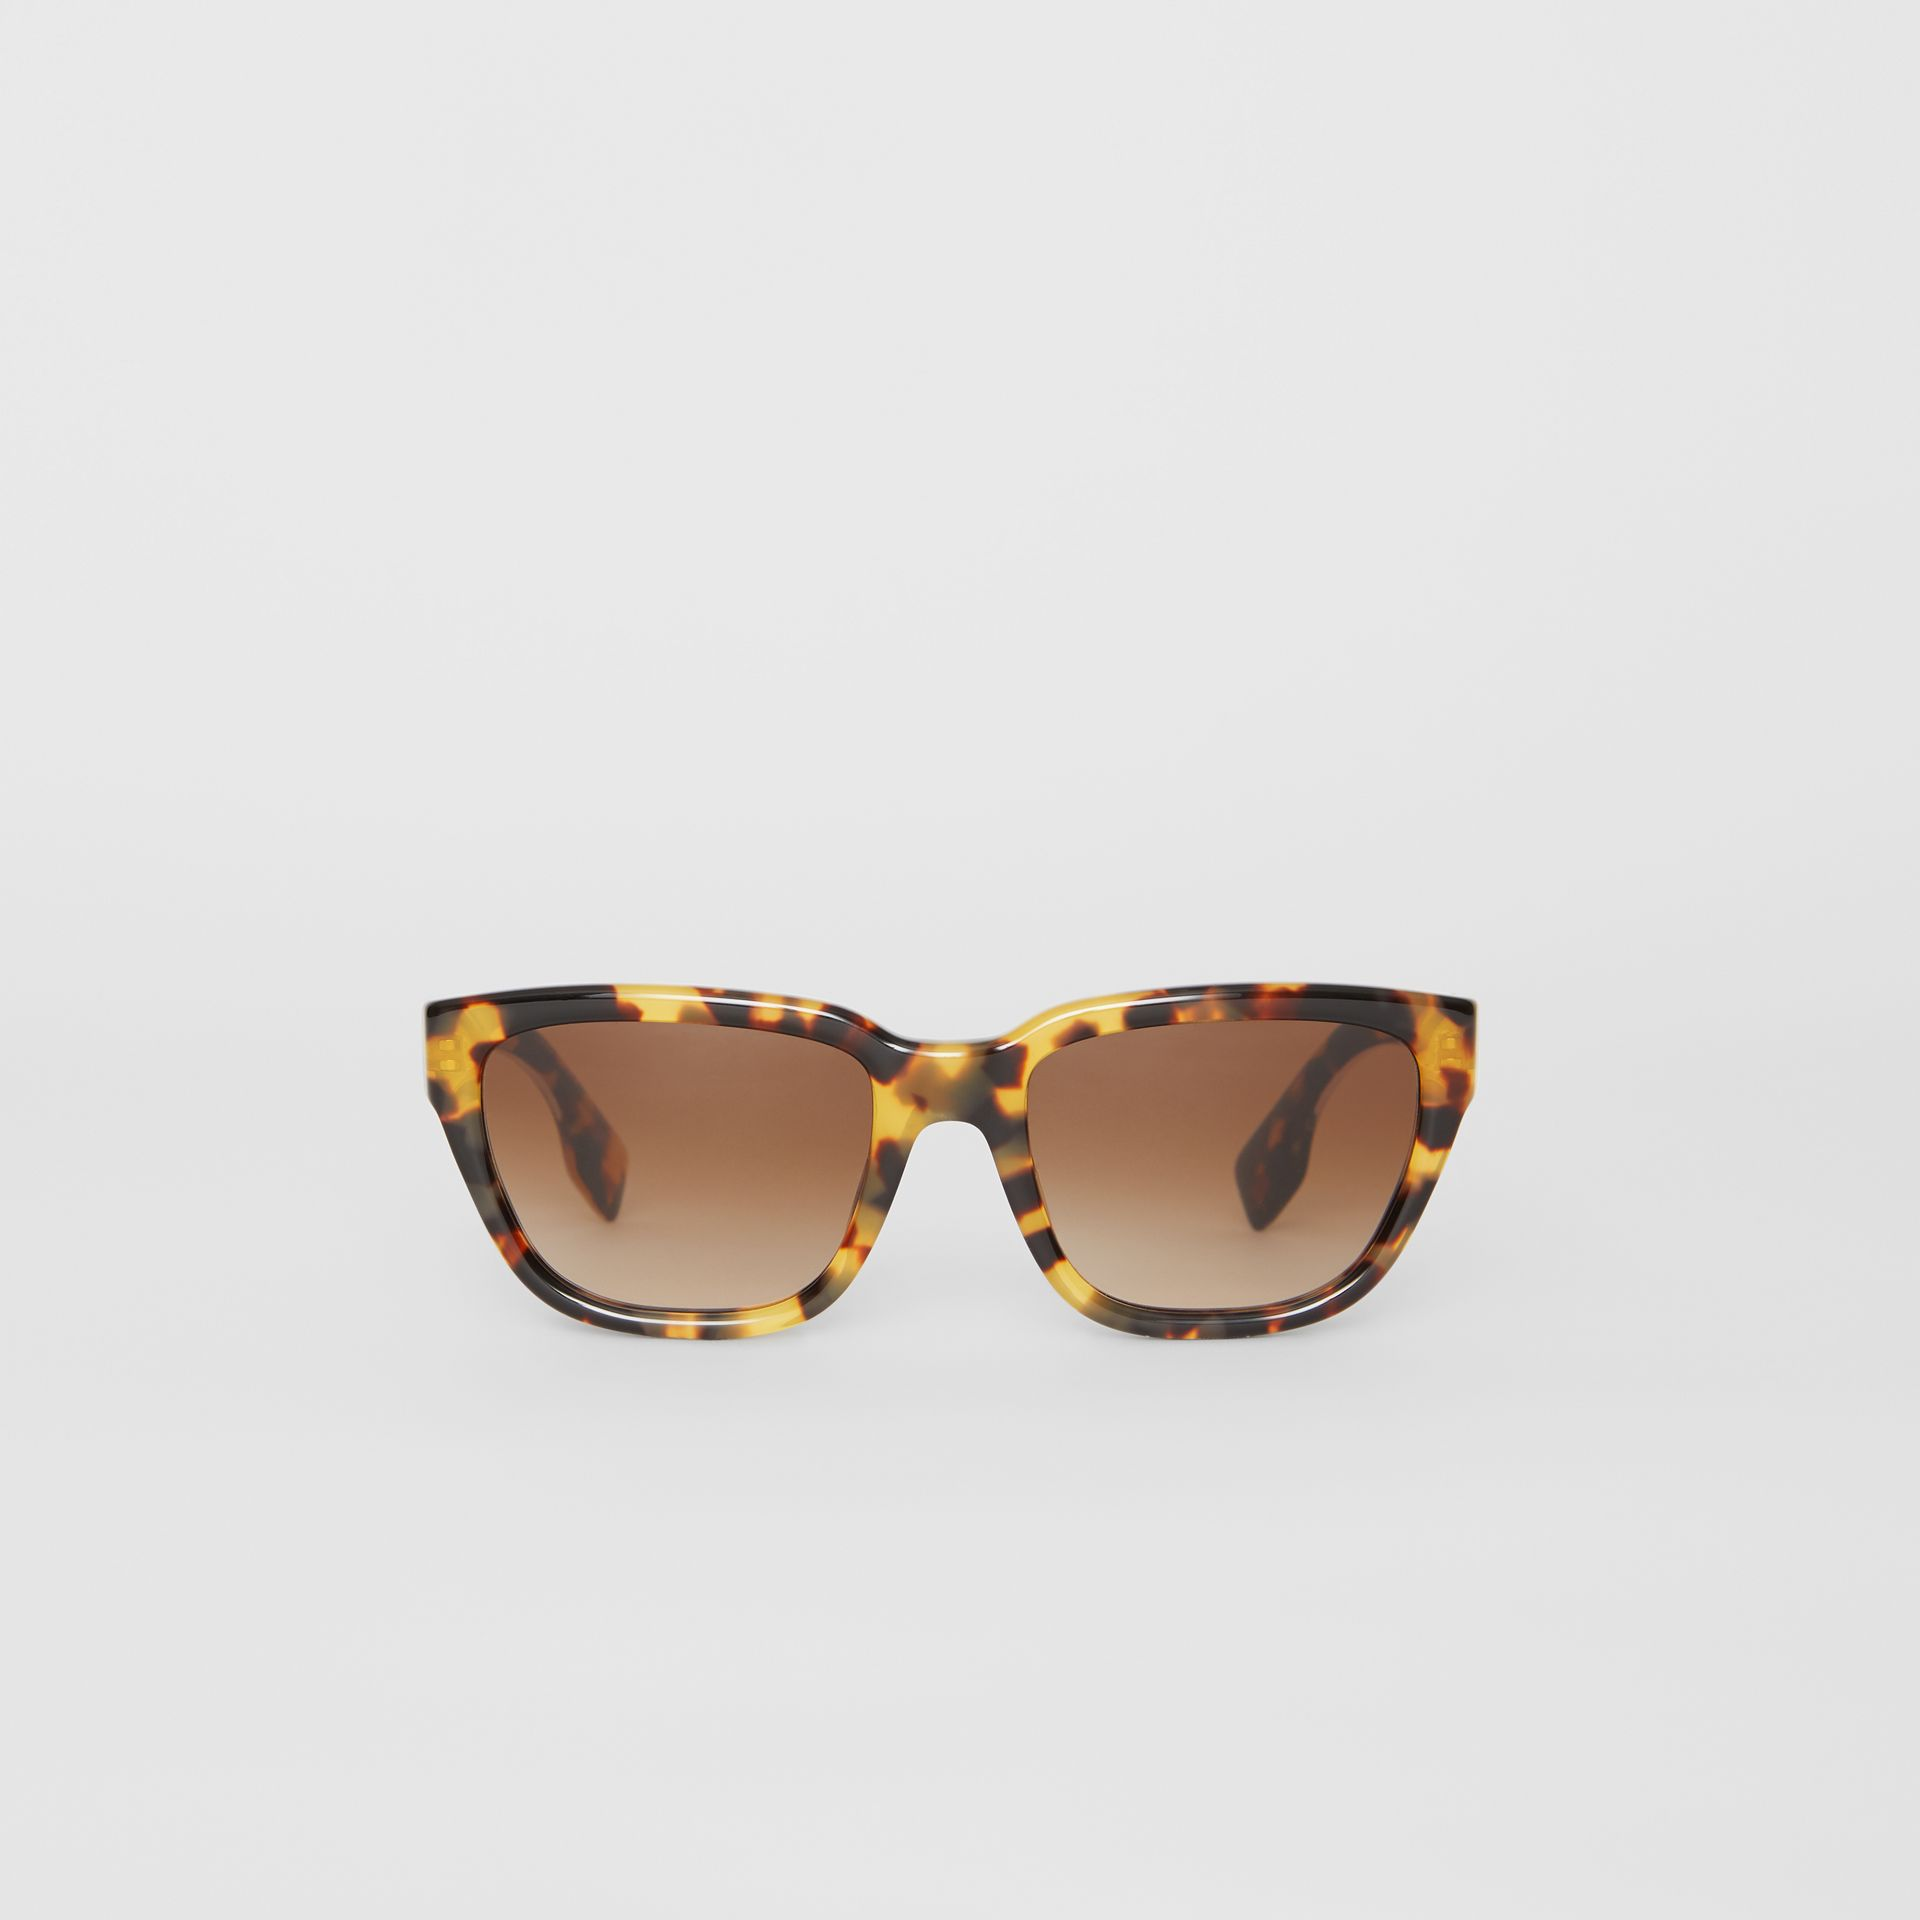 Square Frame Sunglasses in Tortoise Shell - Women | Burberry United Kingdom - gallery image 0